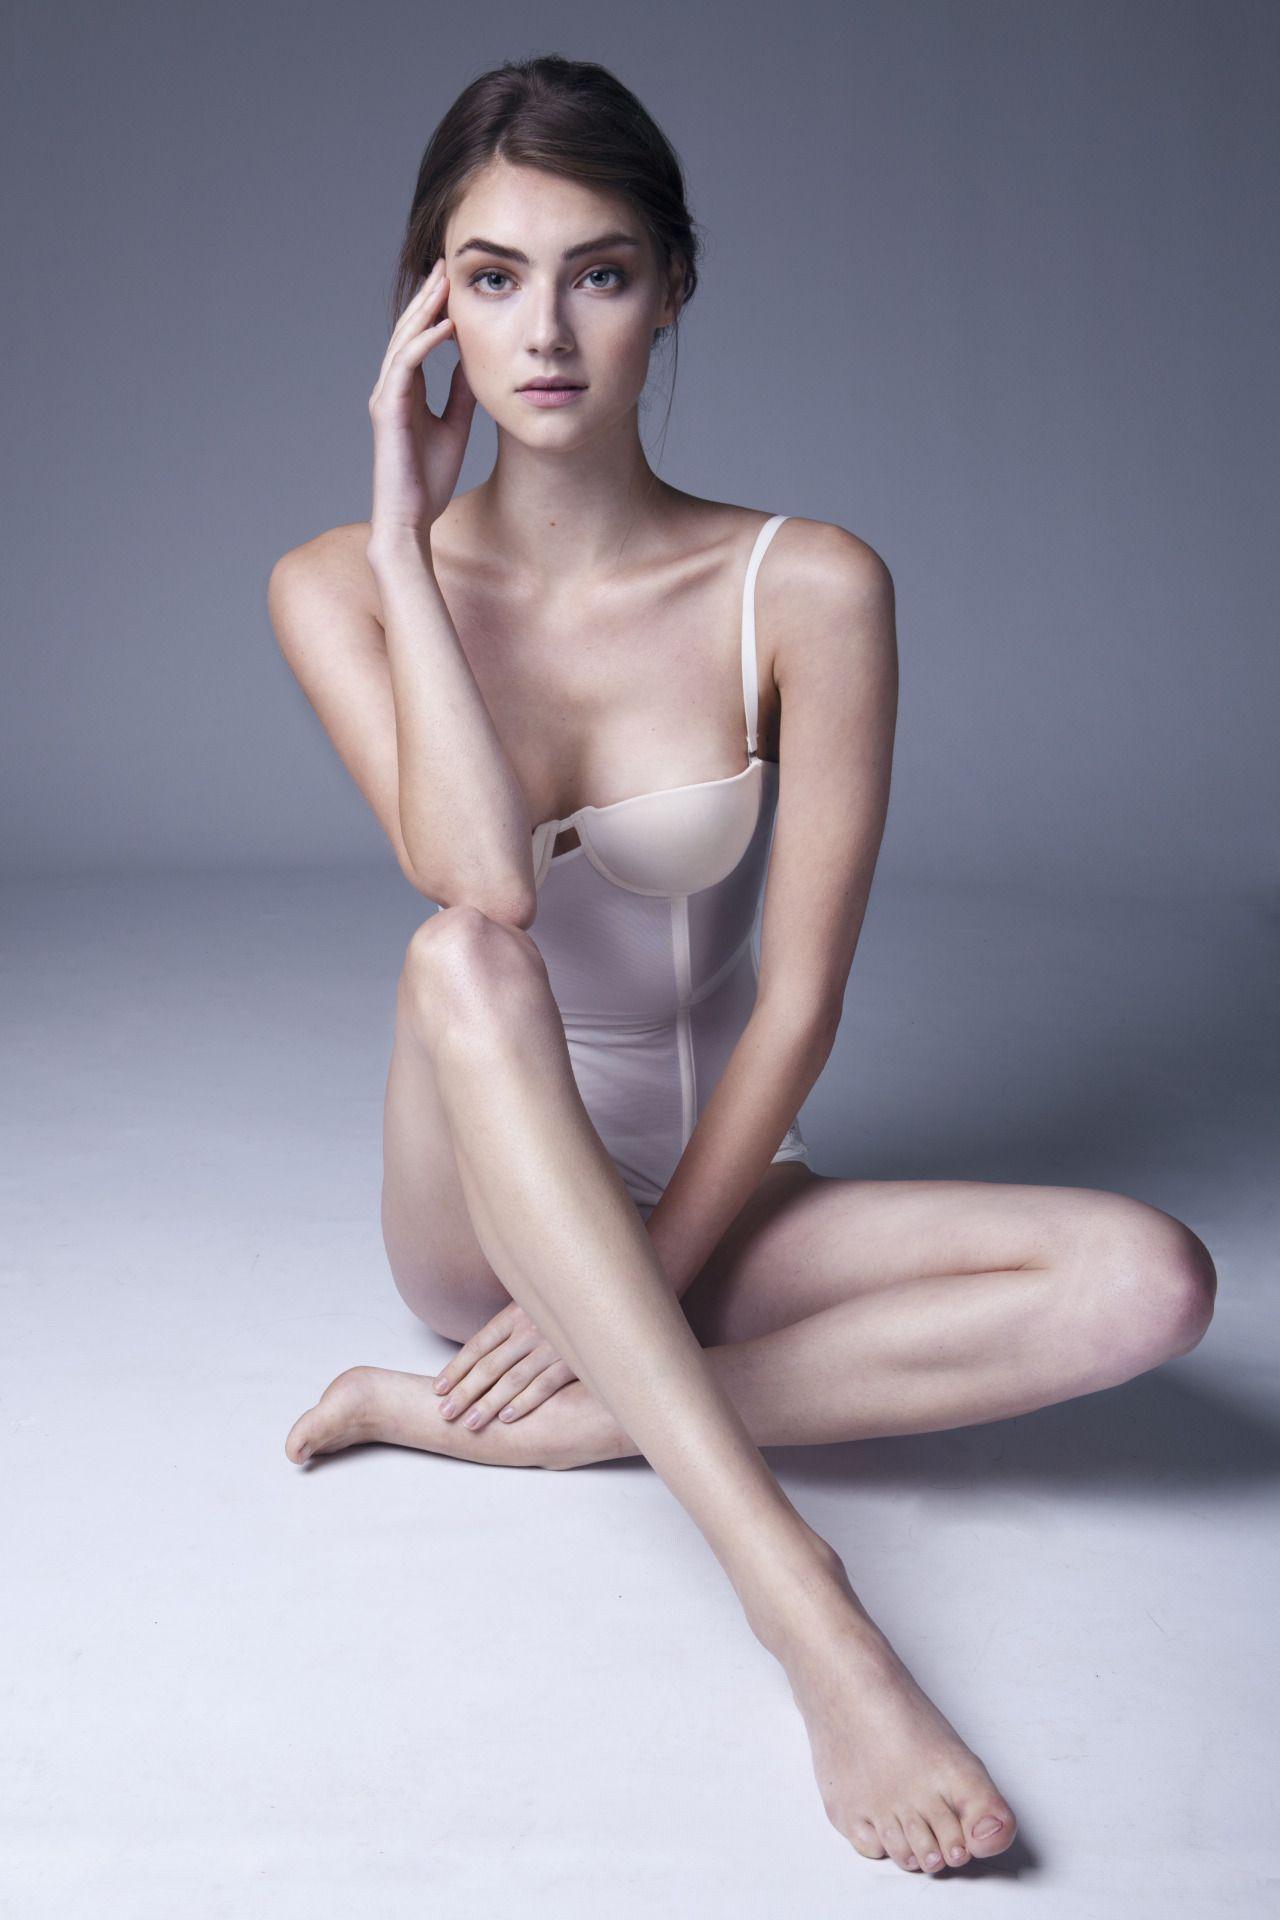 18-year-old Ales Kafelnikova shot topless for a British magazine 12/13/2016